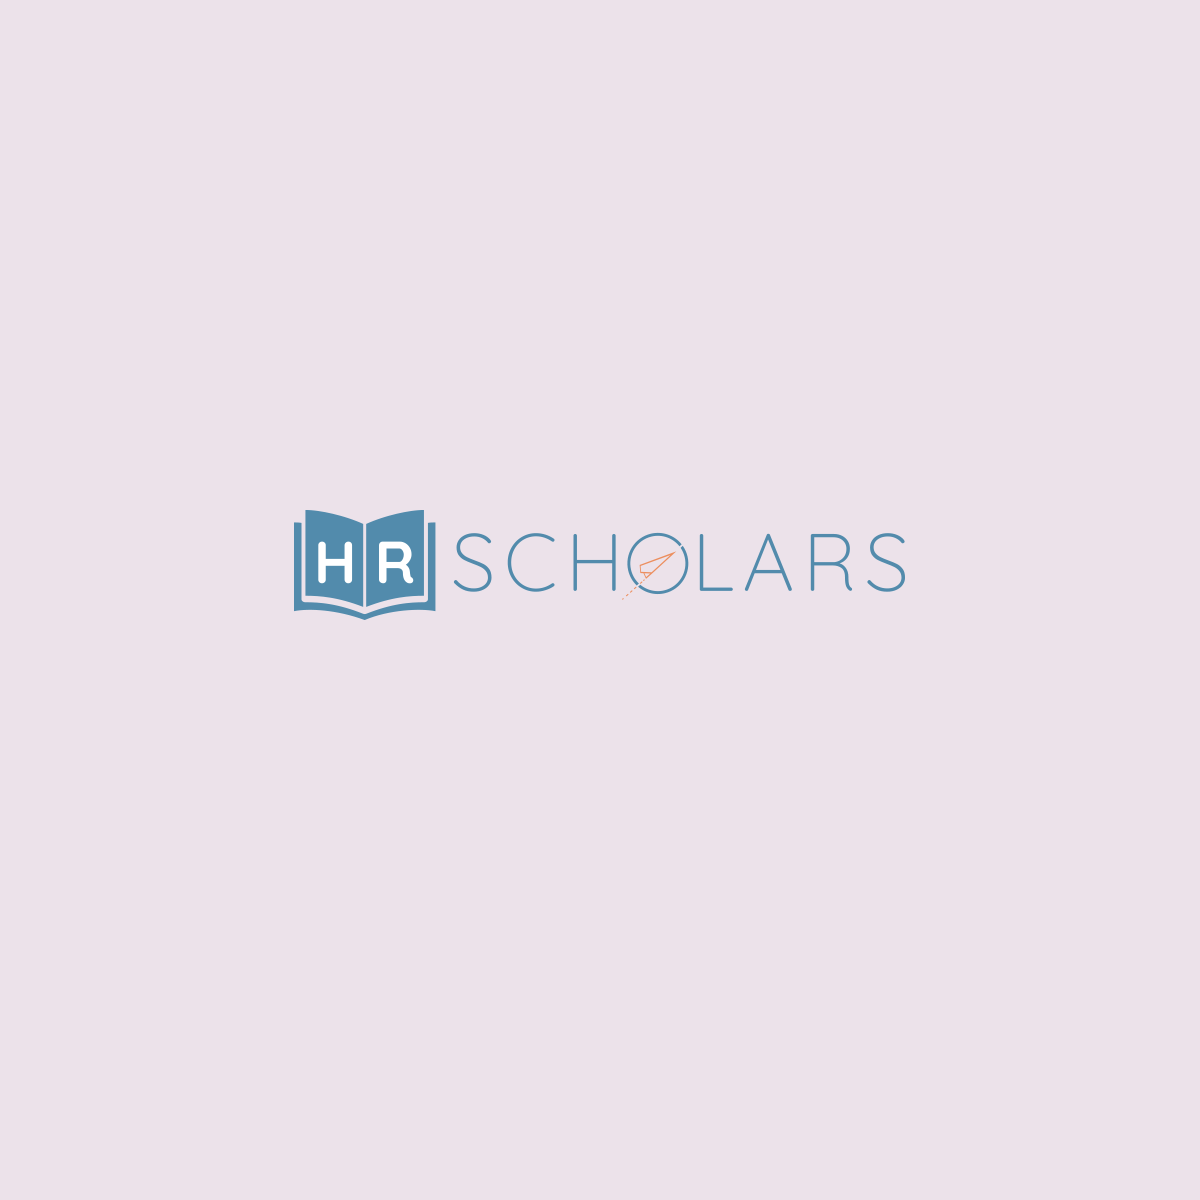 hr-scholars-logo.png